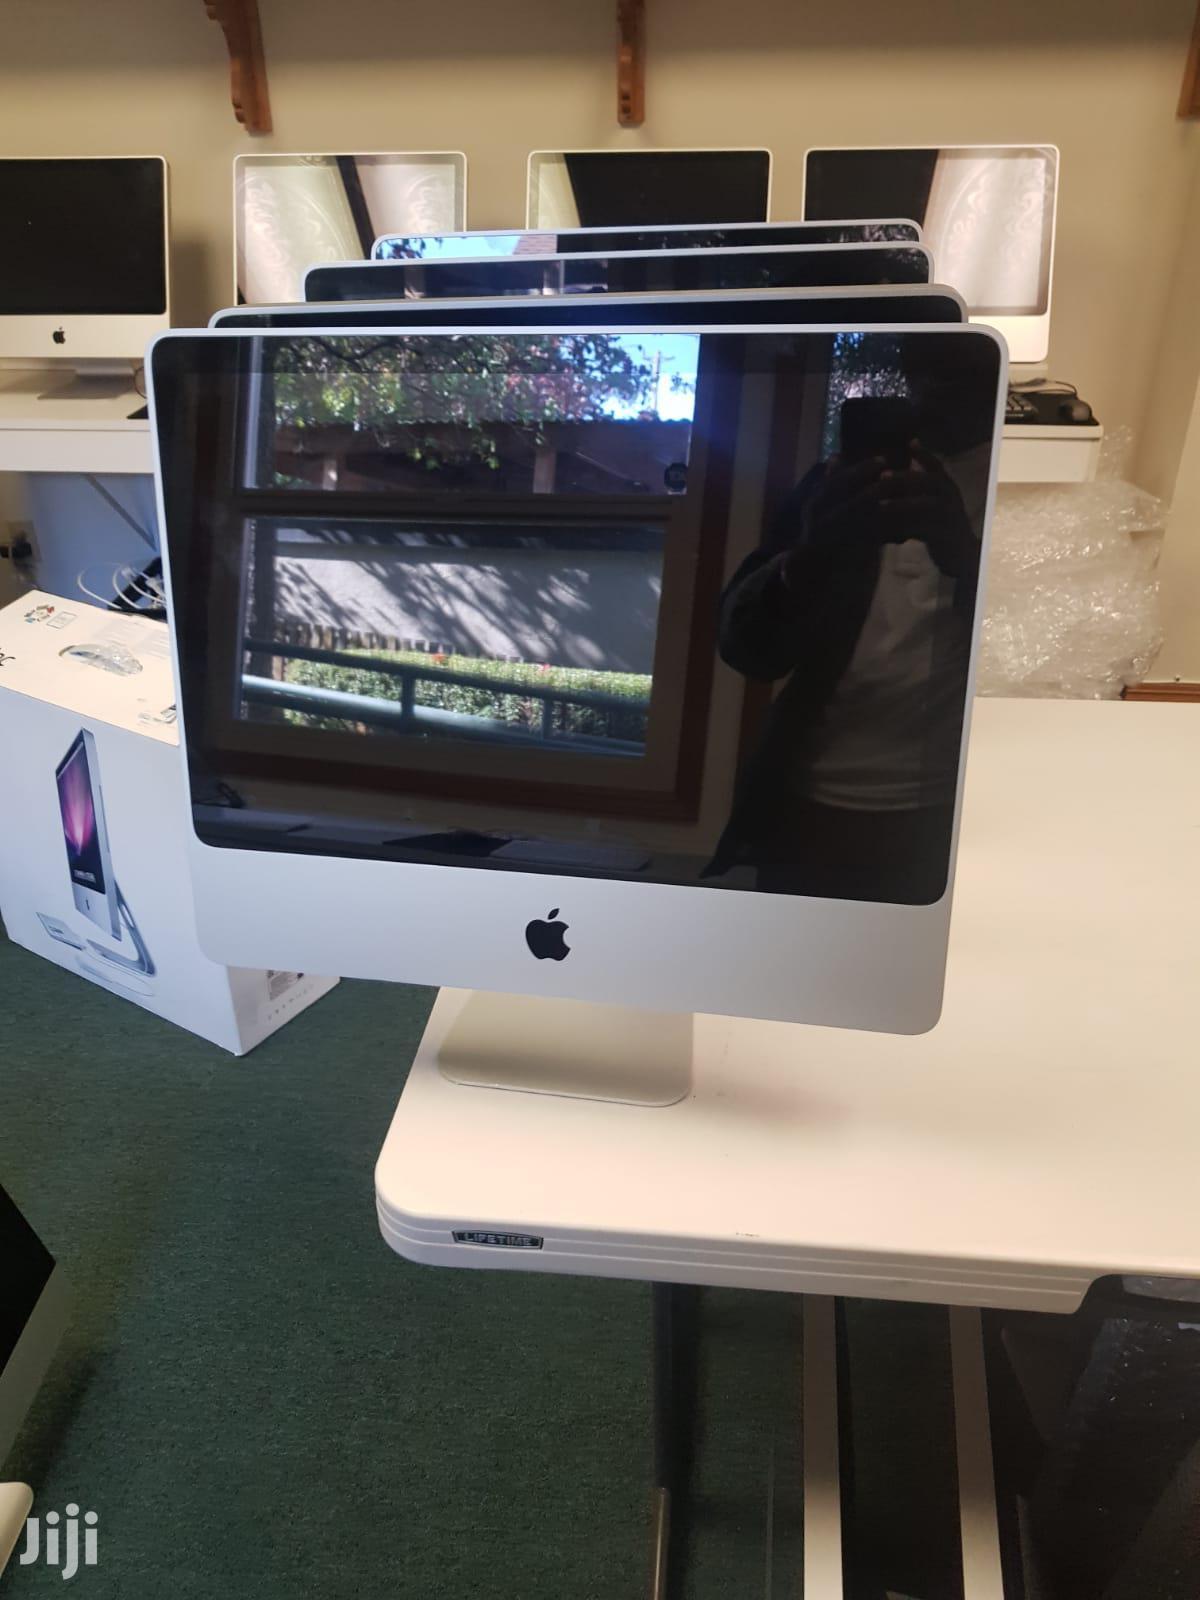 Archive: New Desktop Computer Apple iMac 4GB Intel Core 2 Duo HDD 250GB